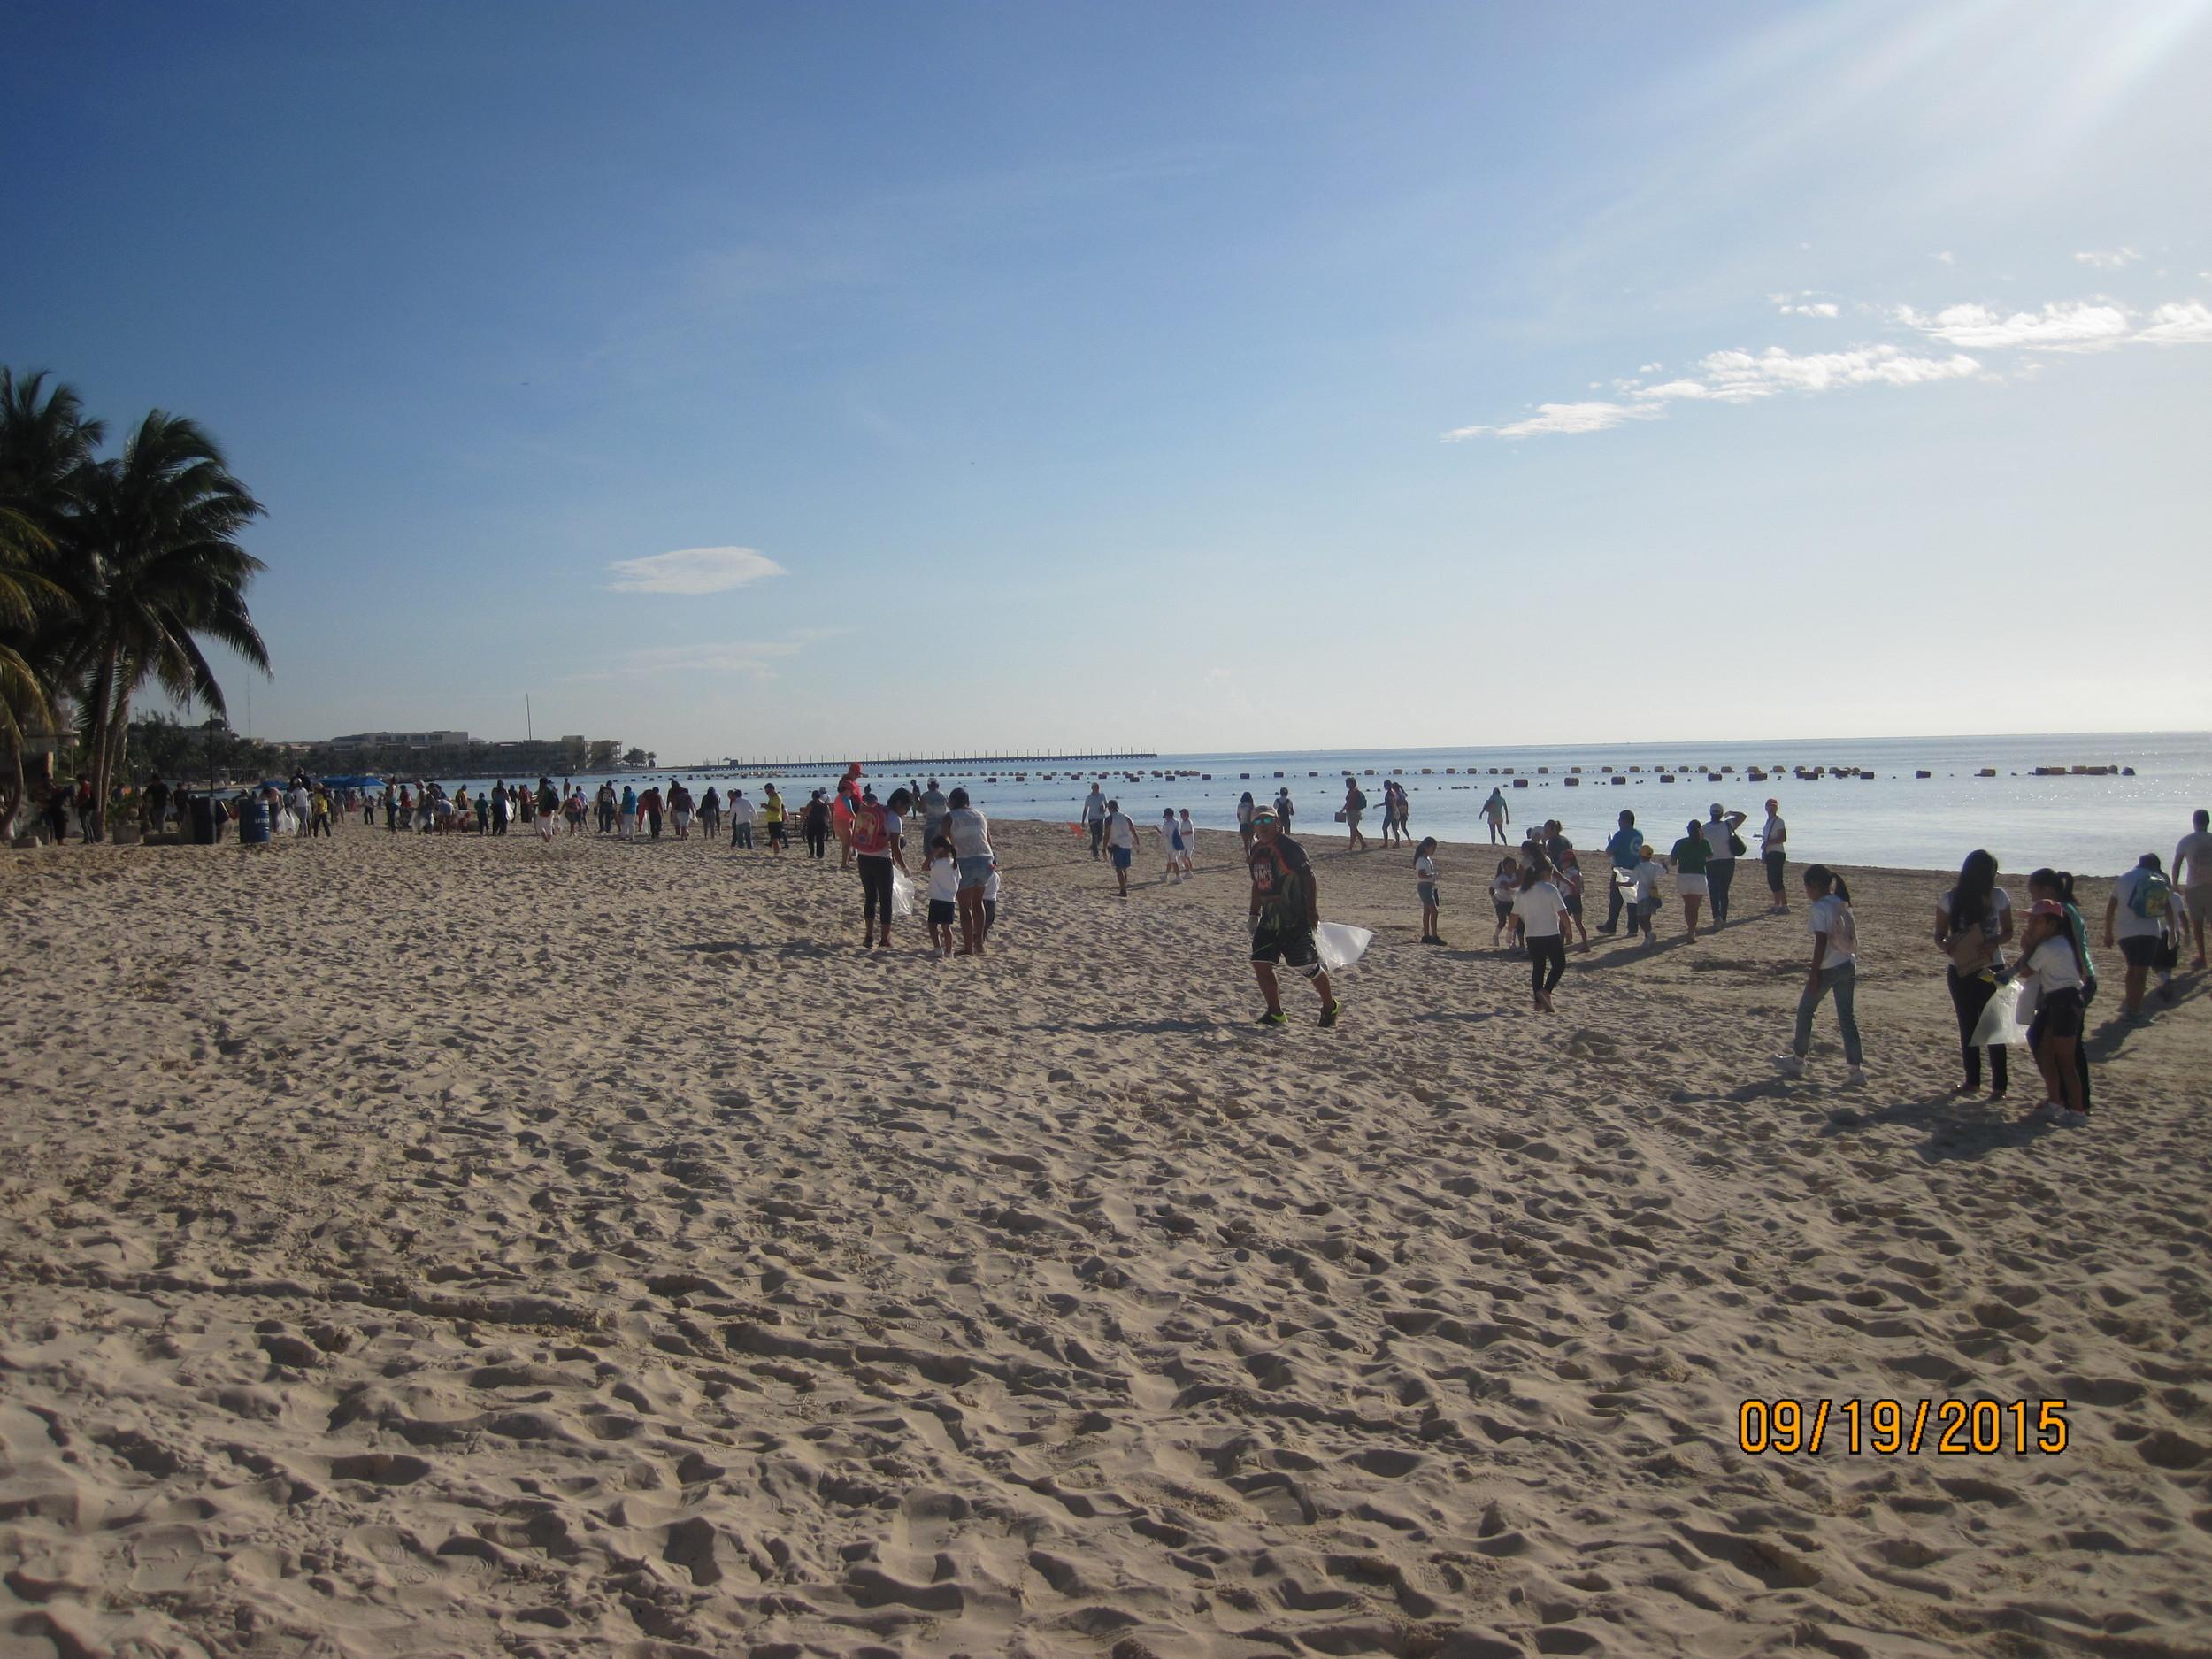 Mexico - Playa del Carmen - ICC2015 - 11.JPG